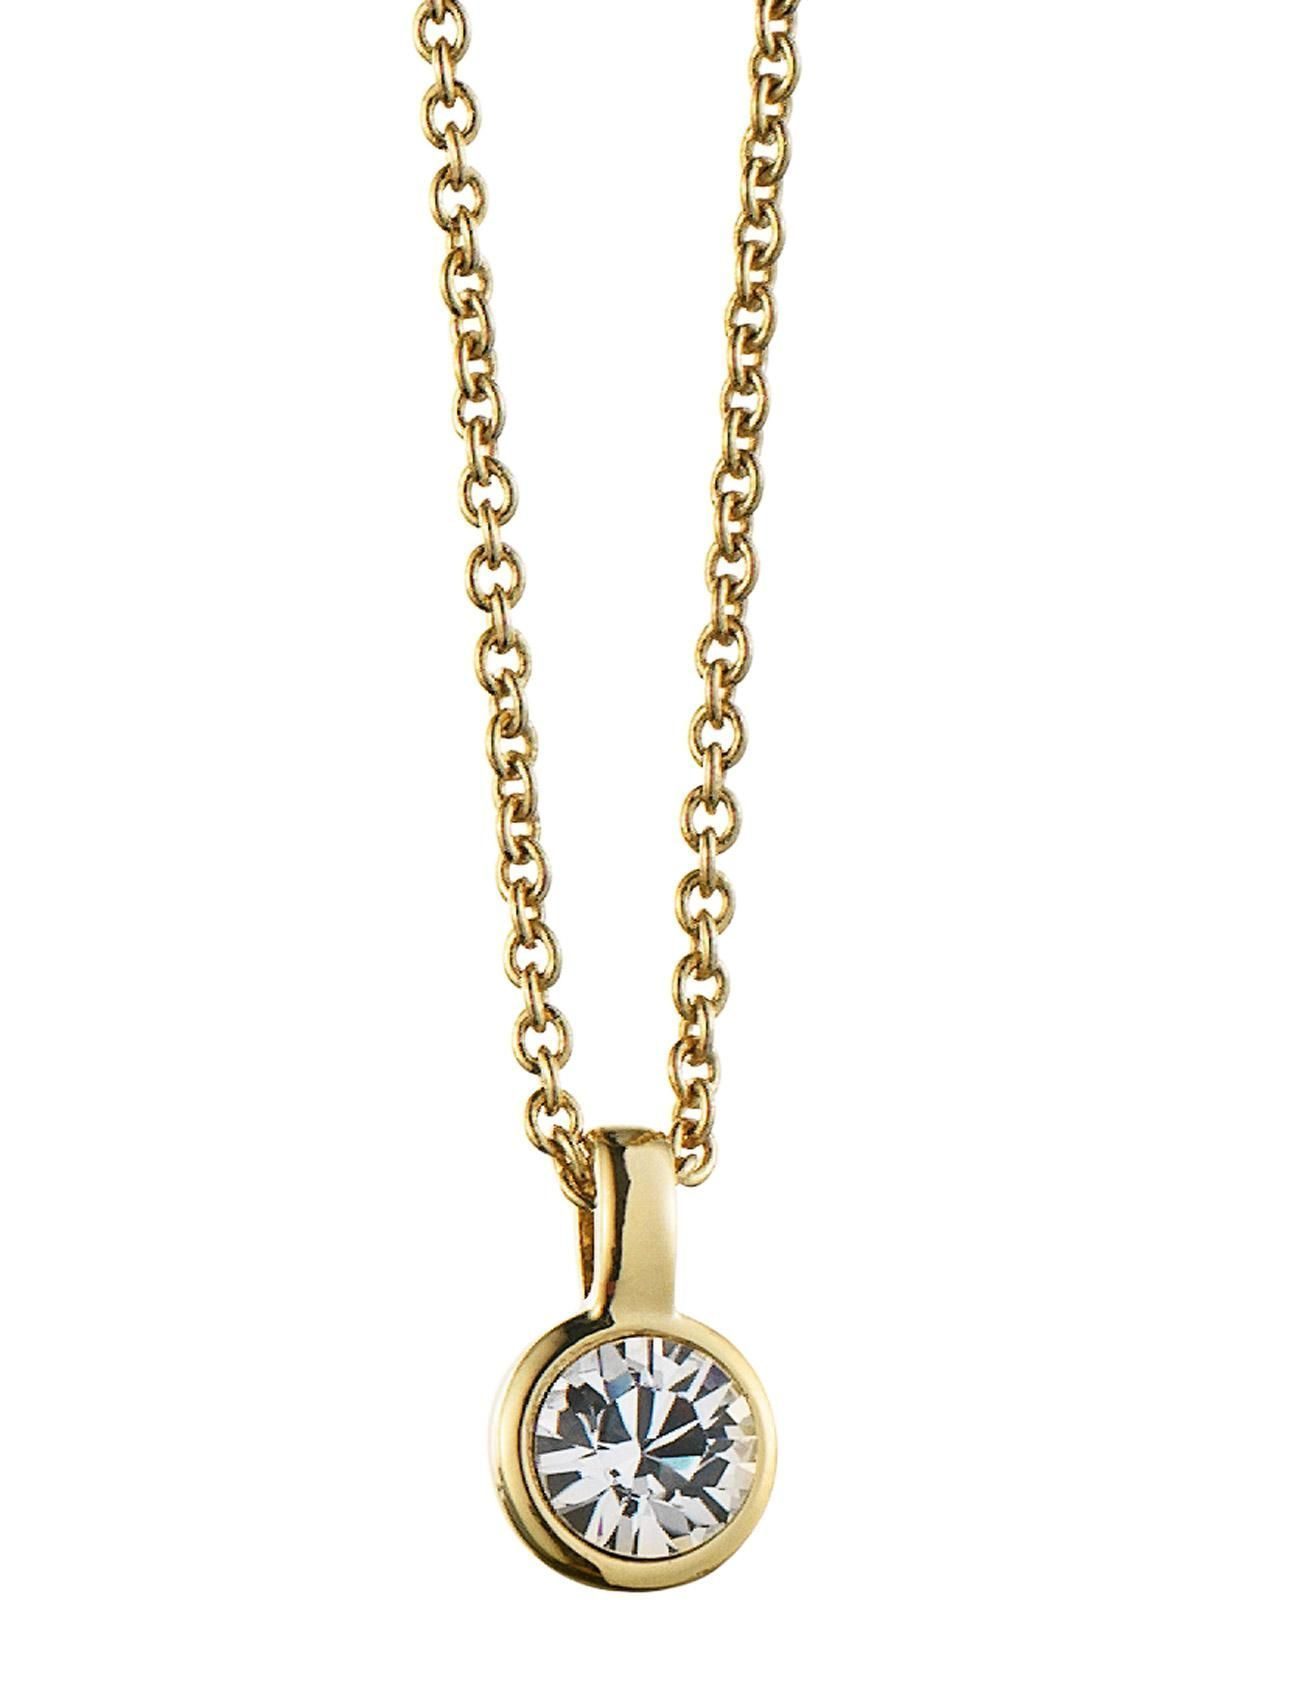 Dyrberg/Kern ette necklace